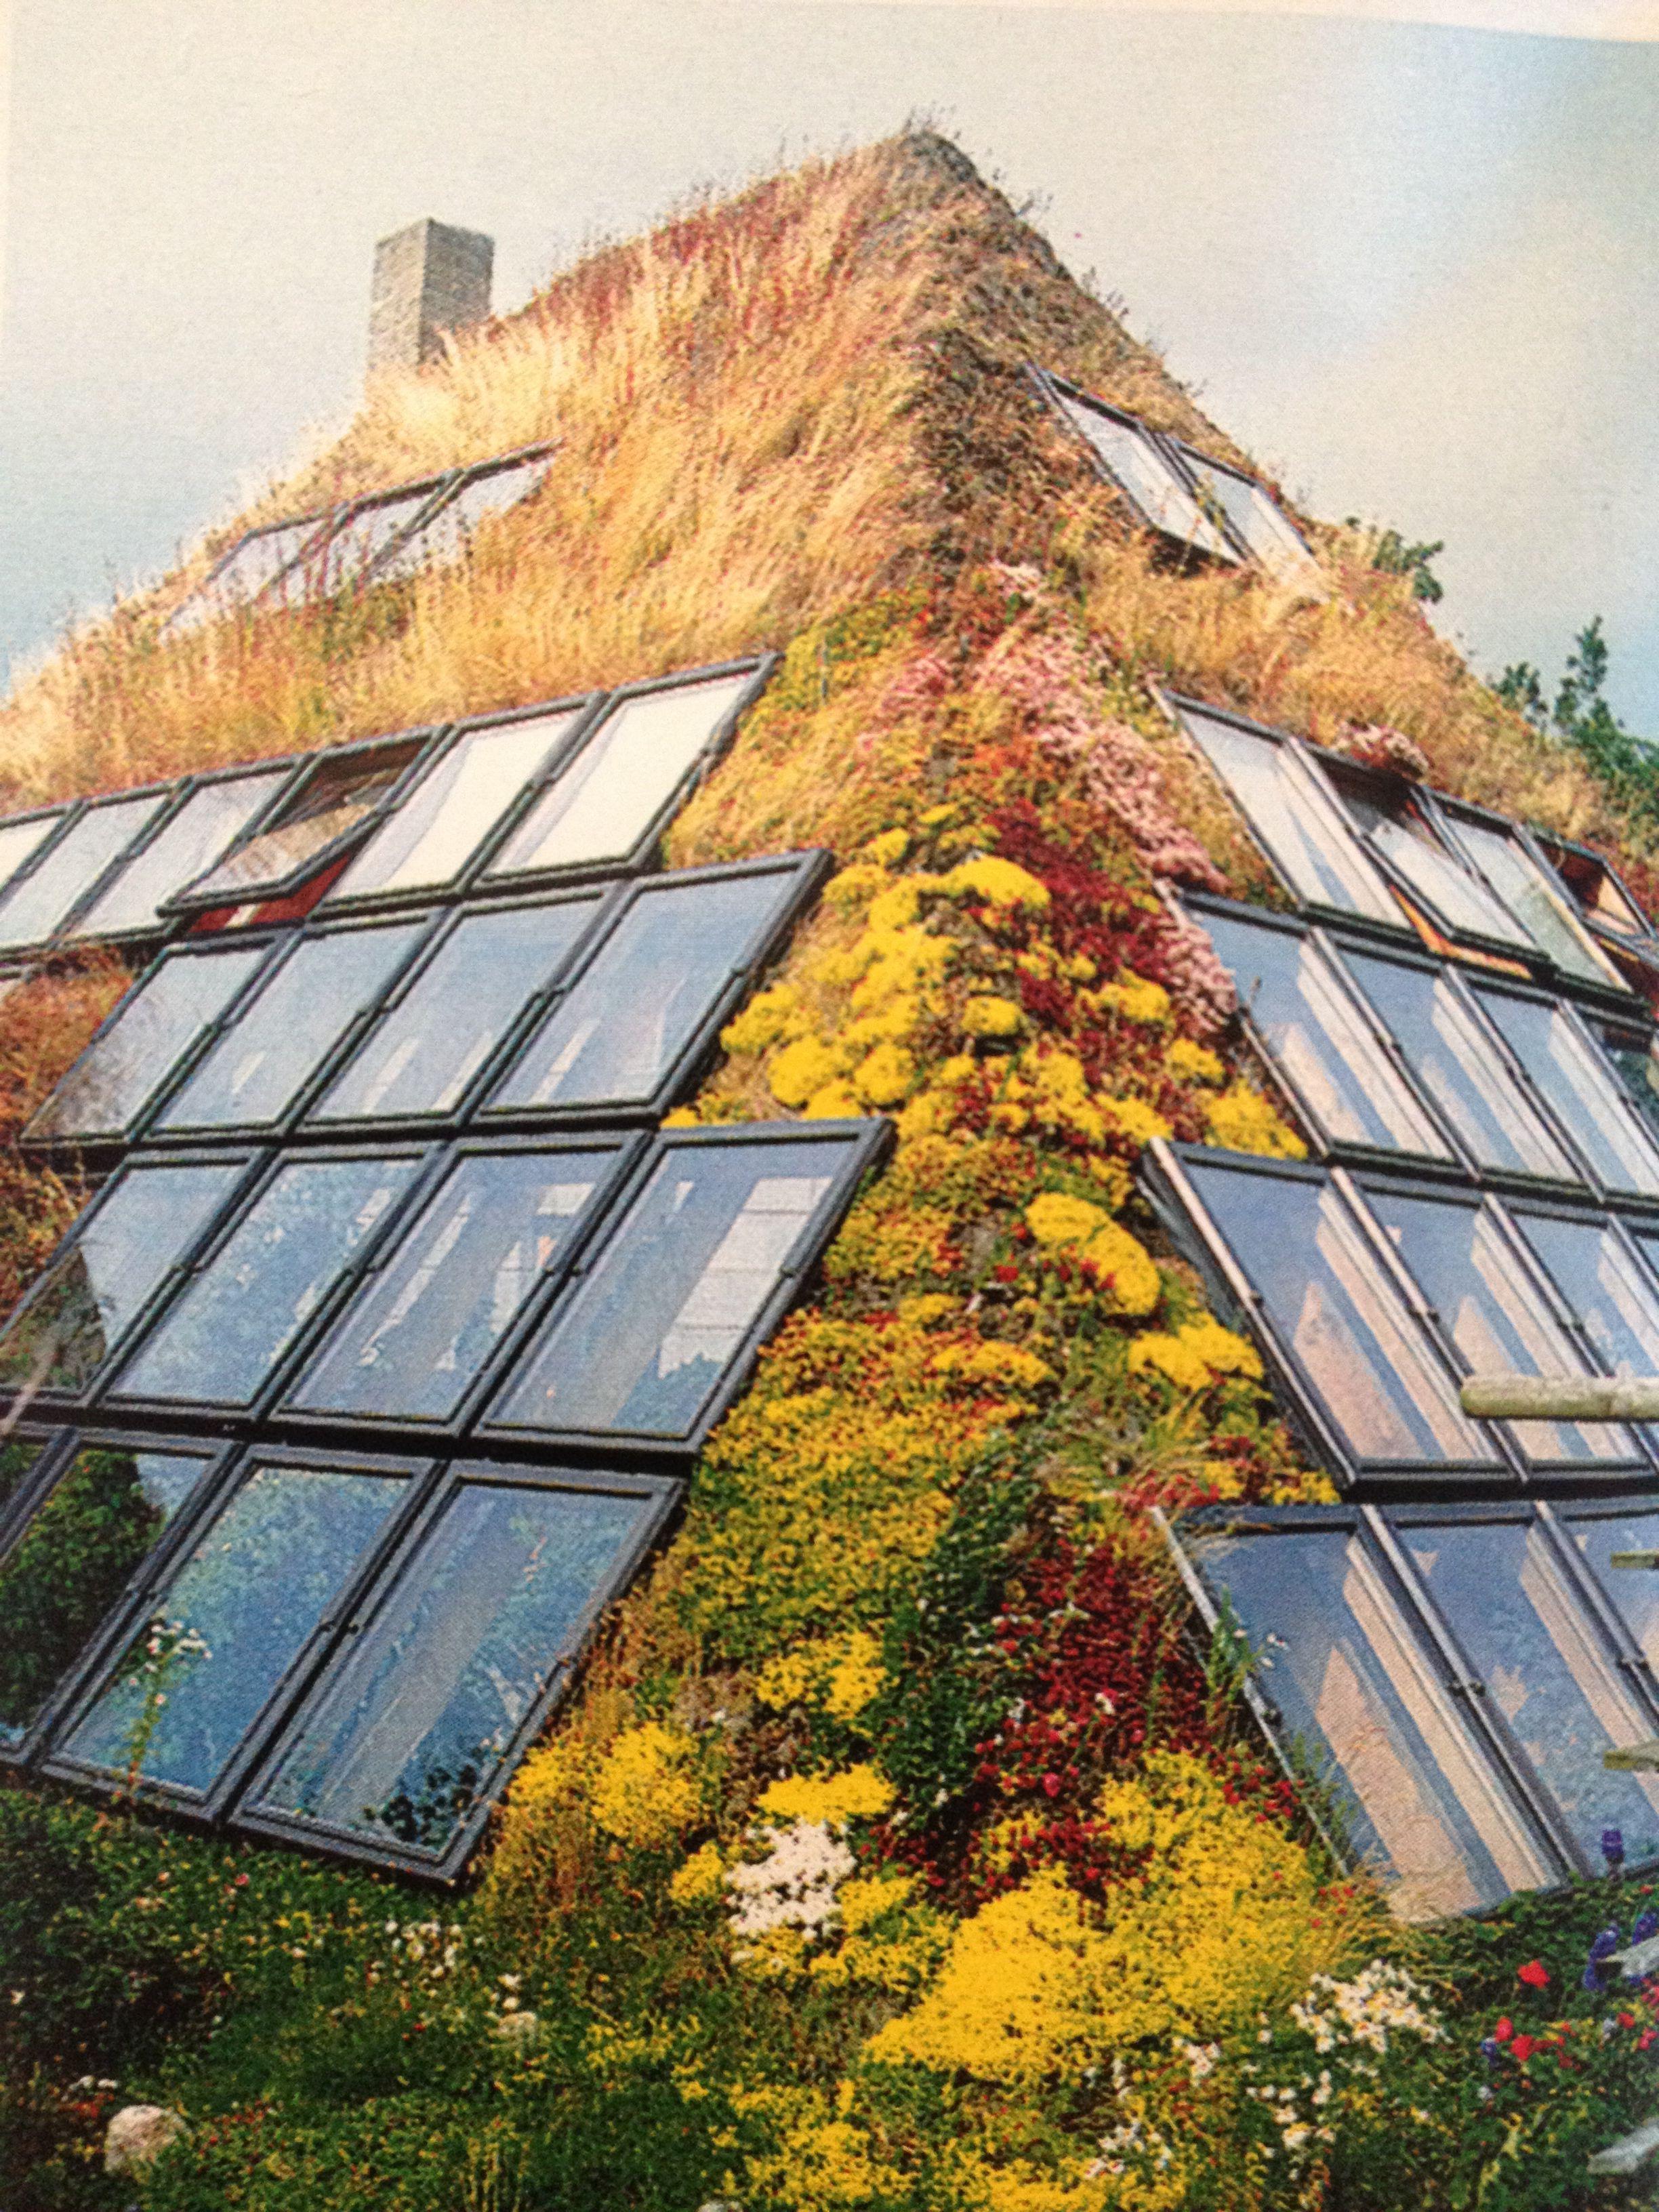 Amazing Pyramid-style Earth Sheltered Home Sustainable